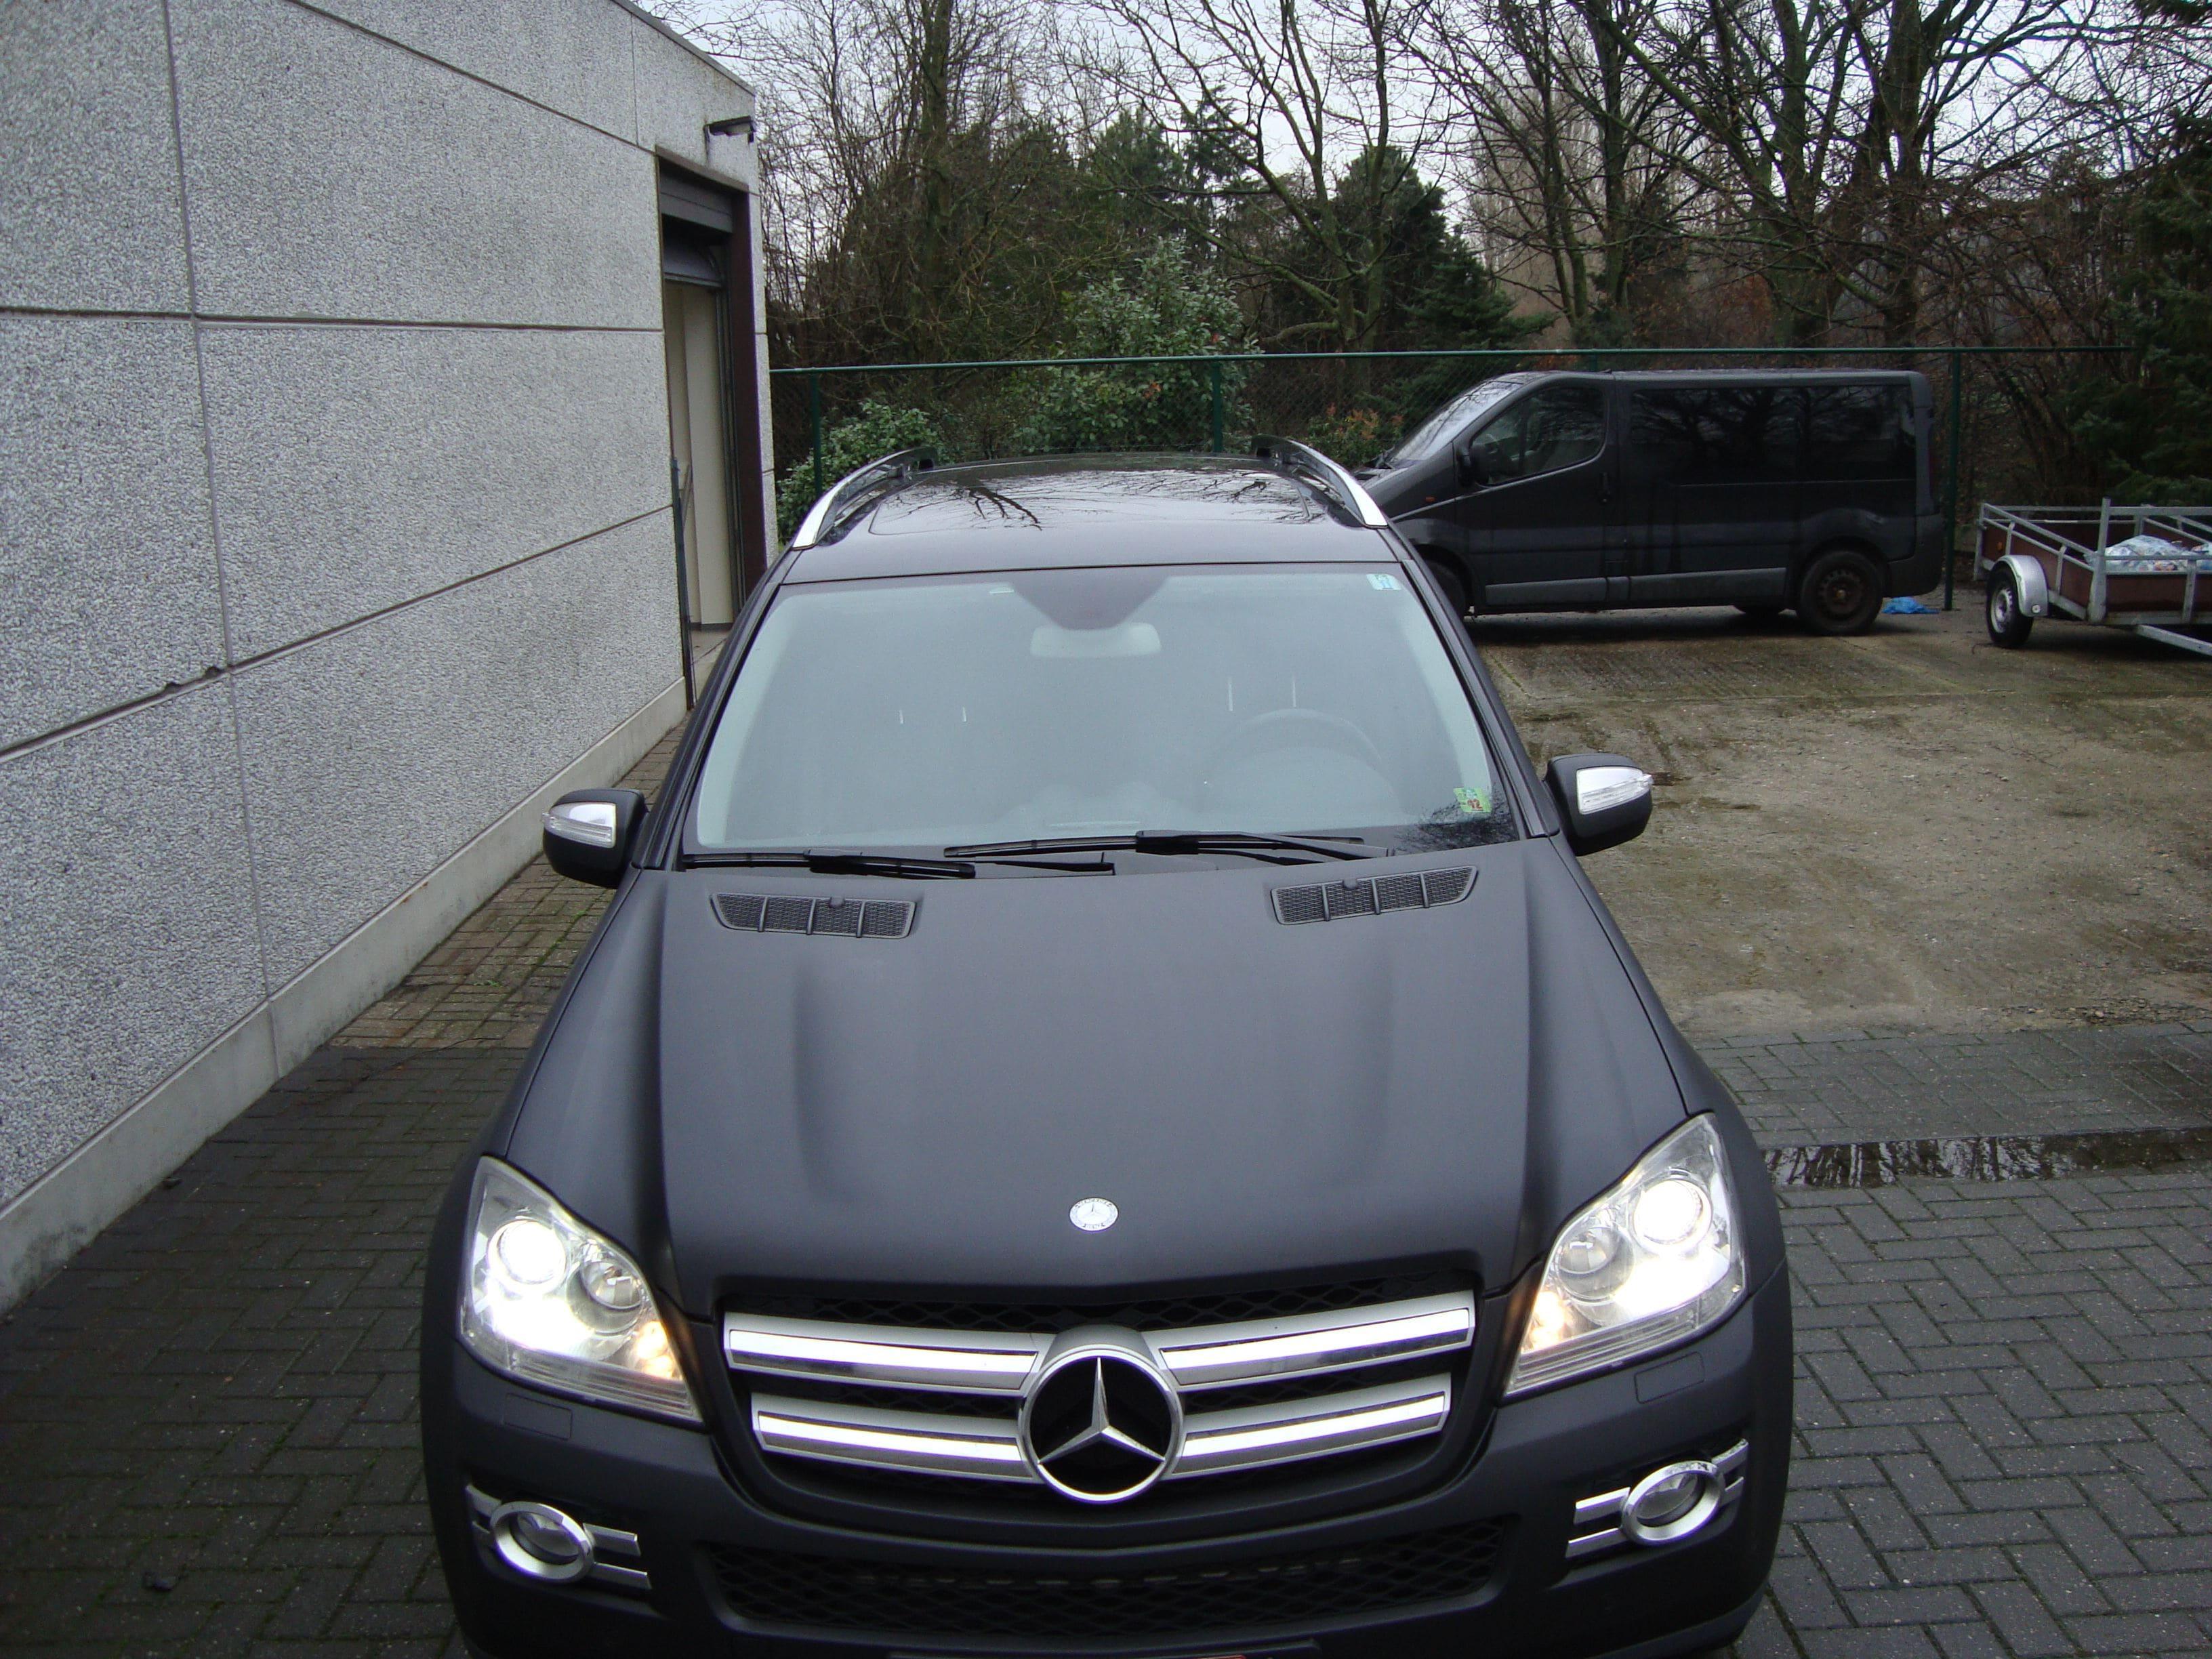 Mercedes GL met Mat Zwarte Wrap, Carwrapping door Wrapmyride.nu Foto-nr:6292, ©2020